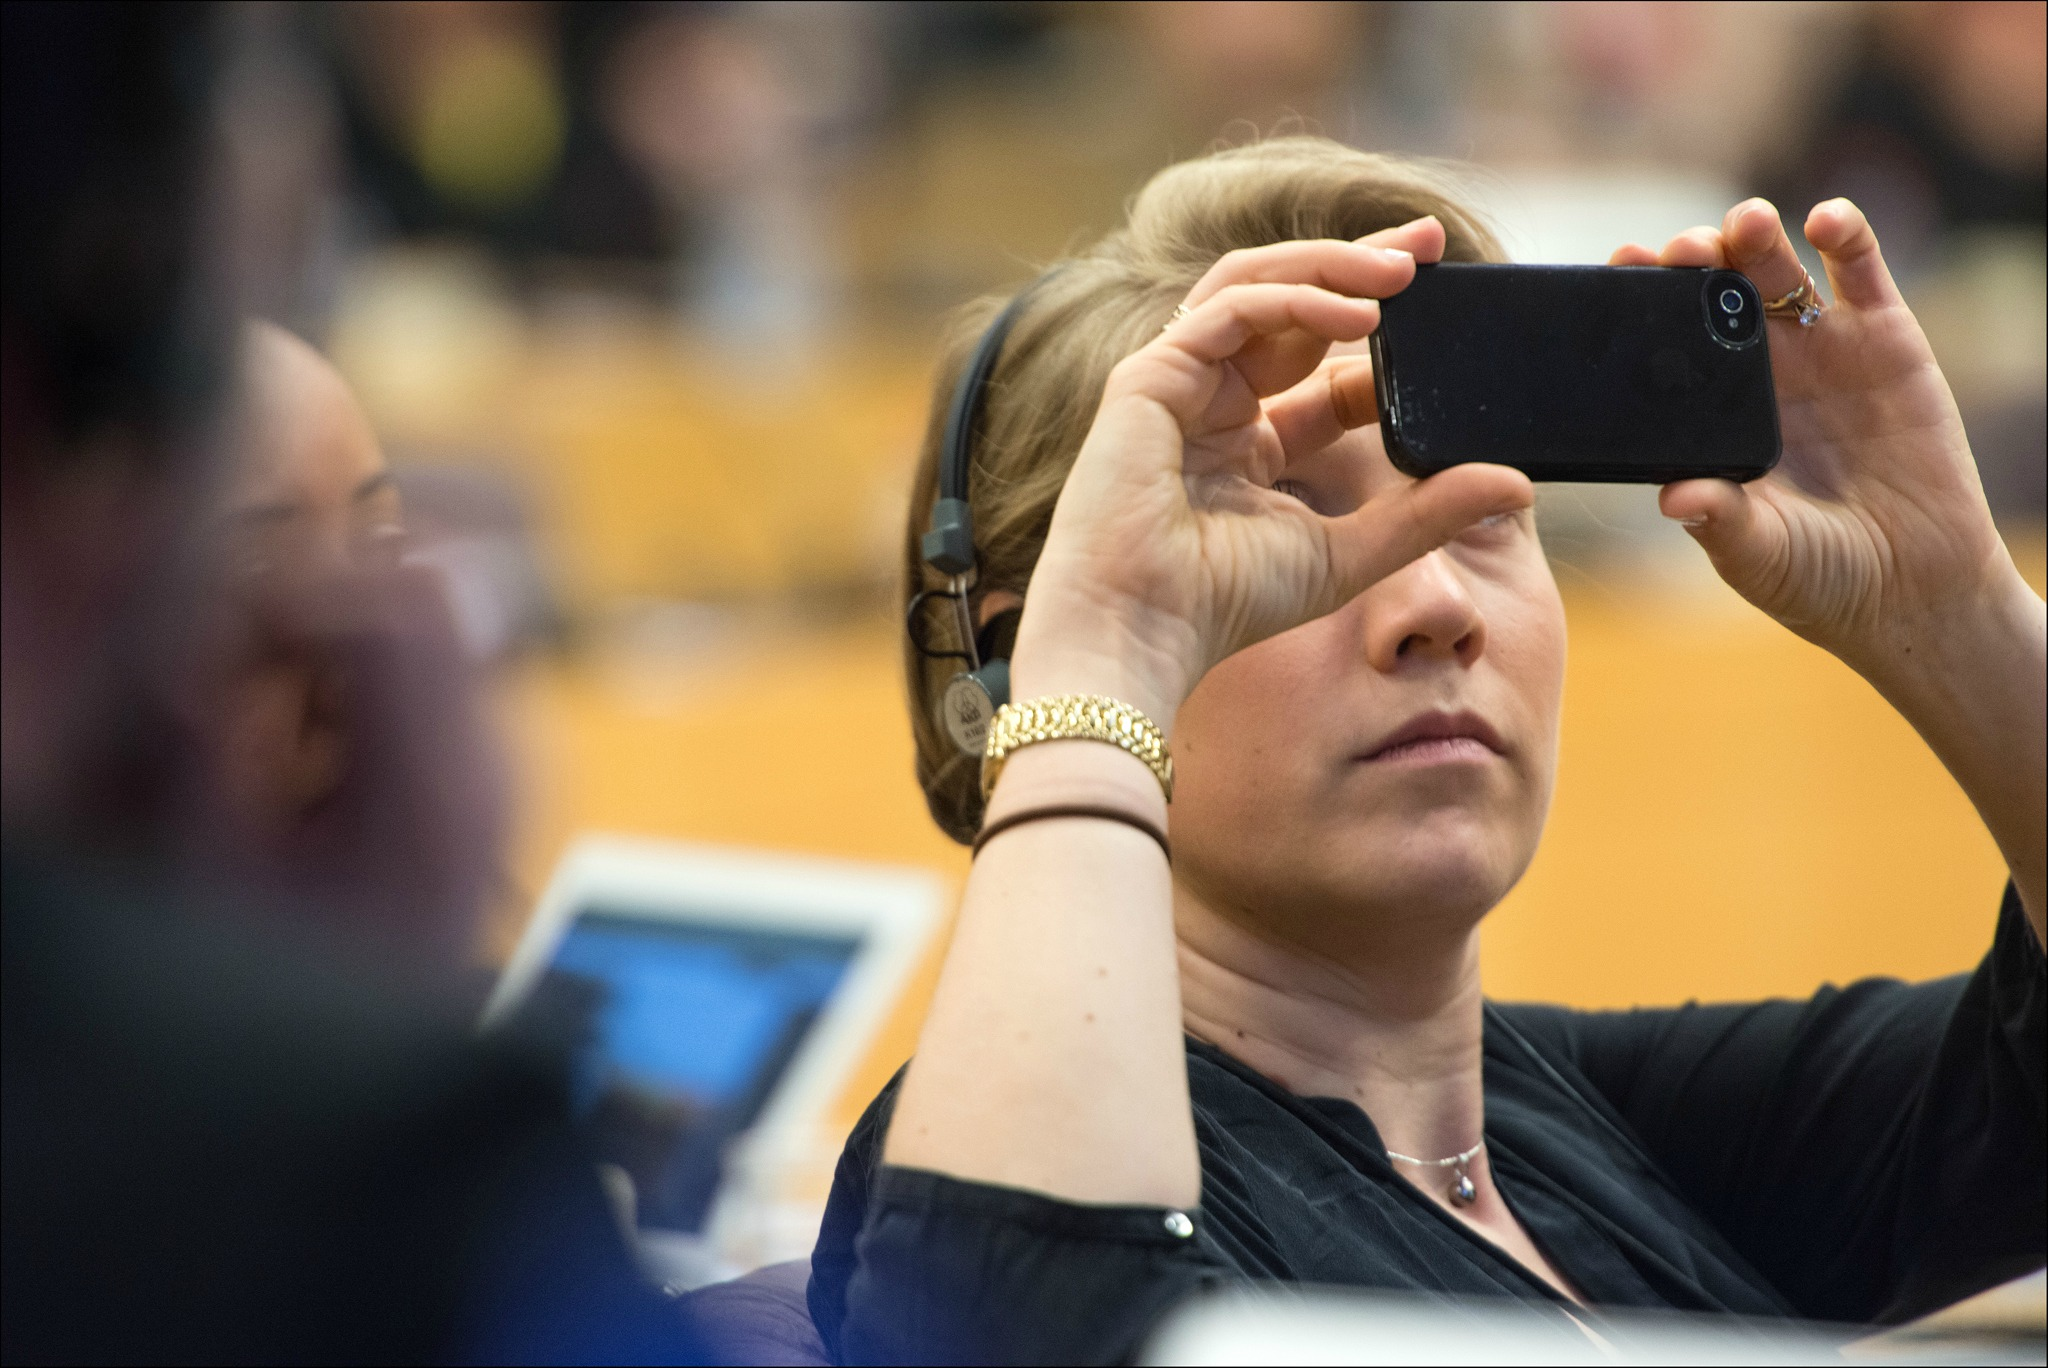 Selfie au Parlement européen [Parlement européen]